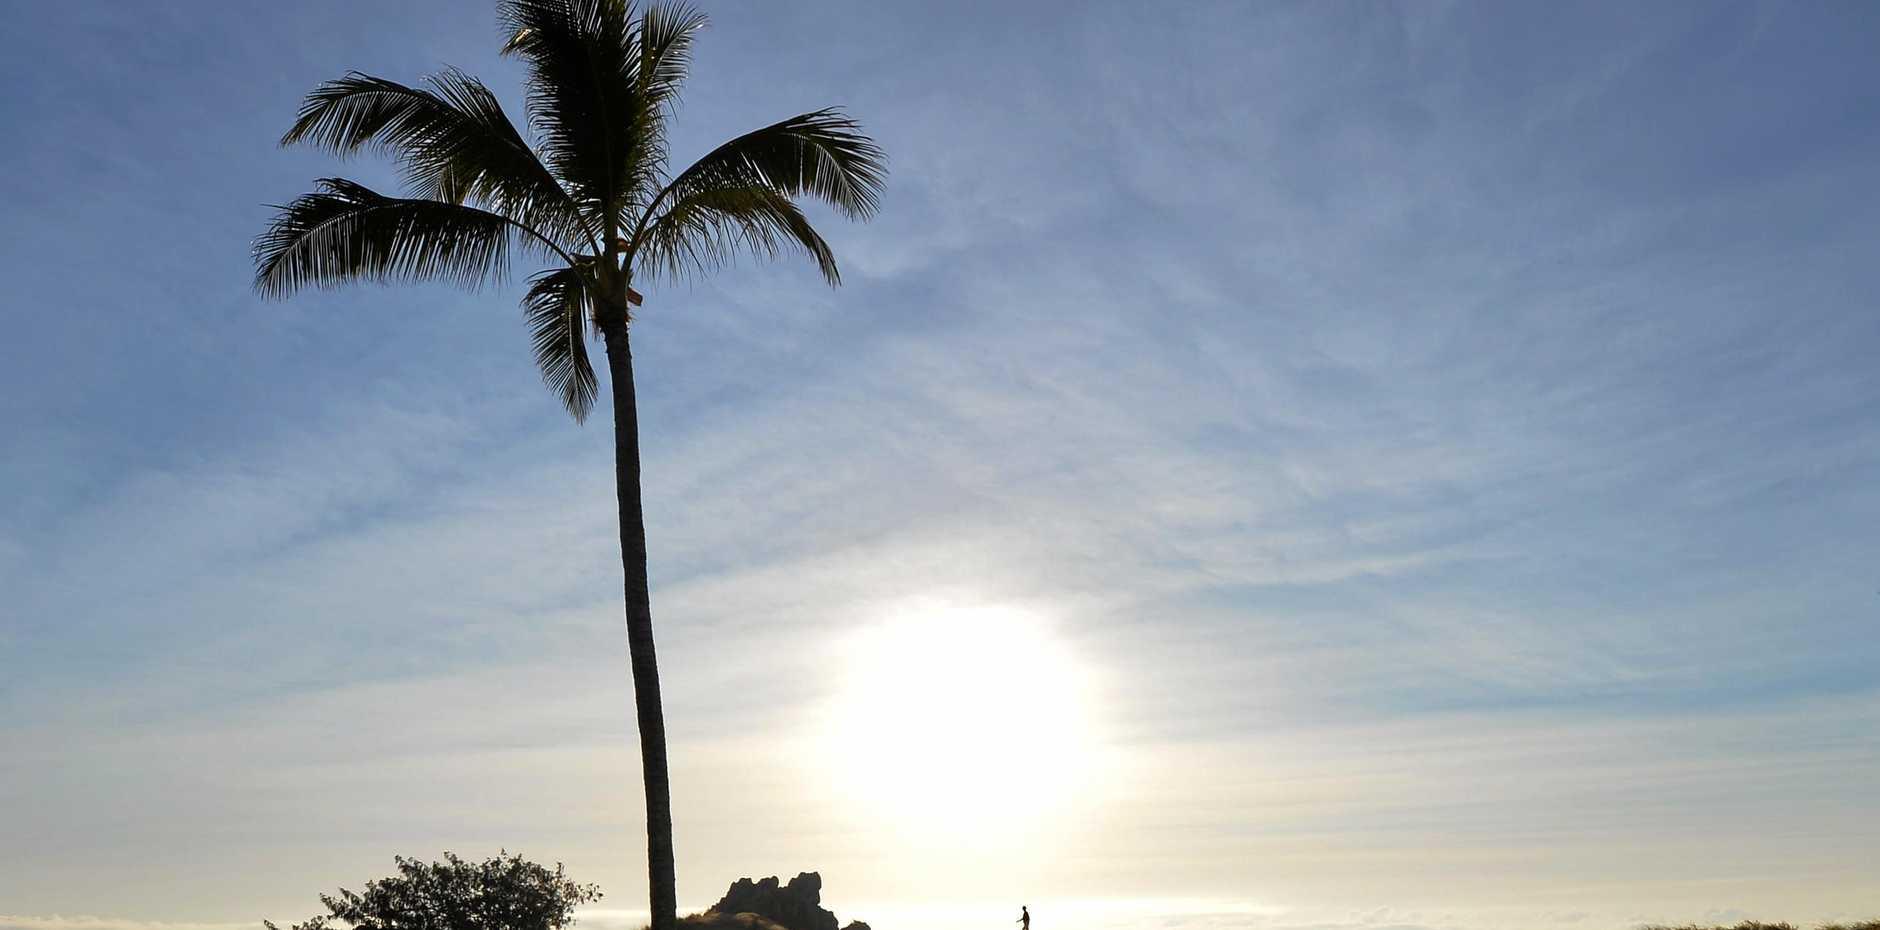 Early morning views around Mackay. Lamberts Beach lookout.